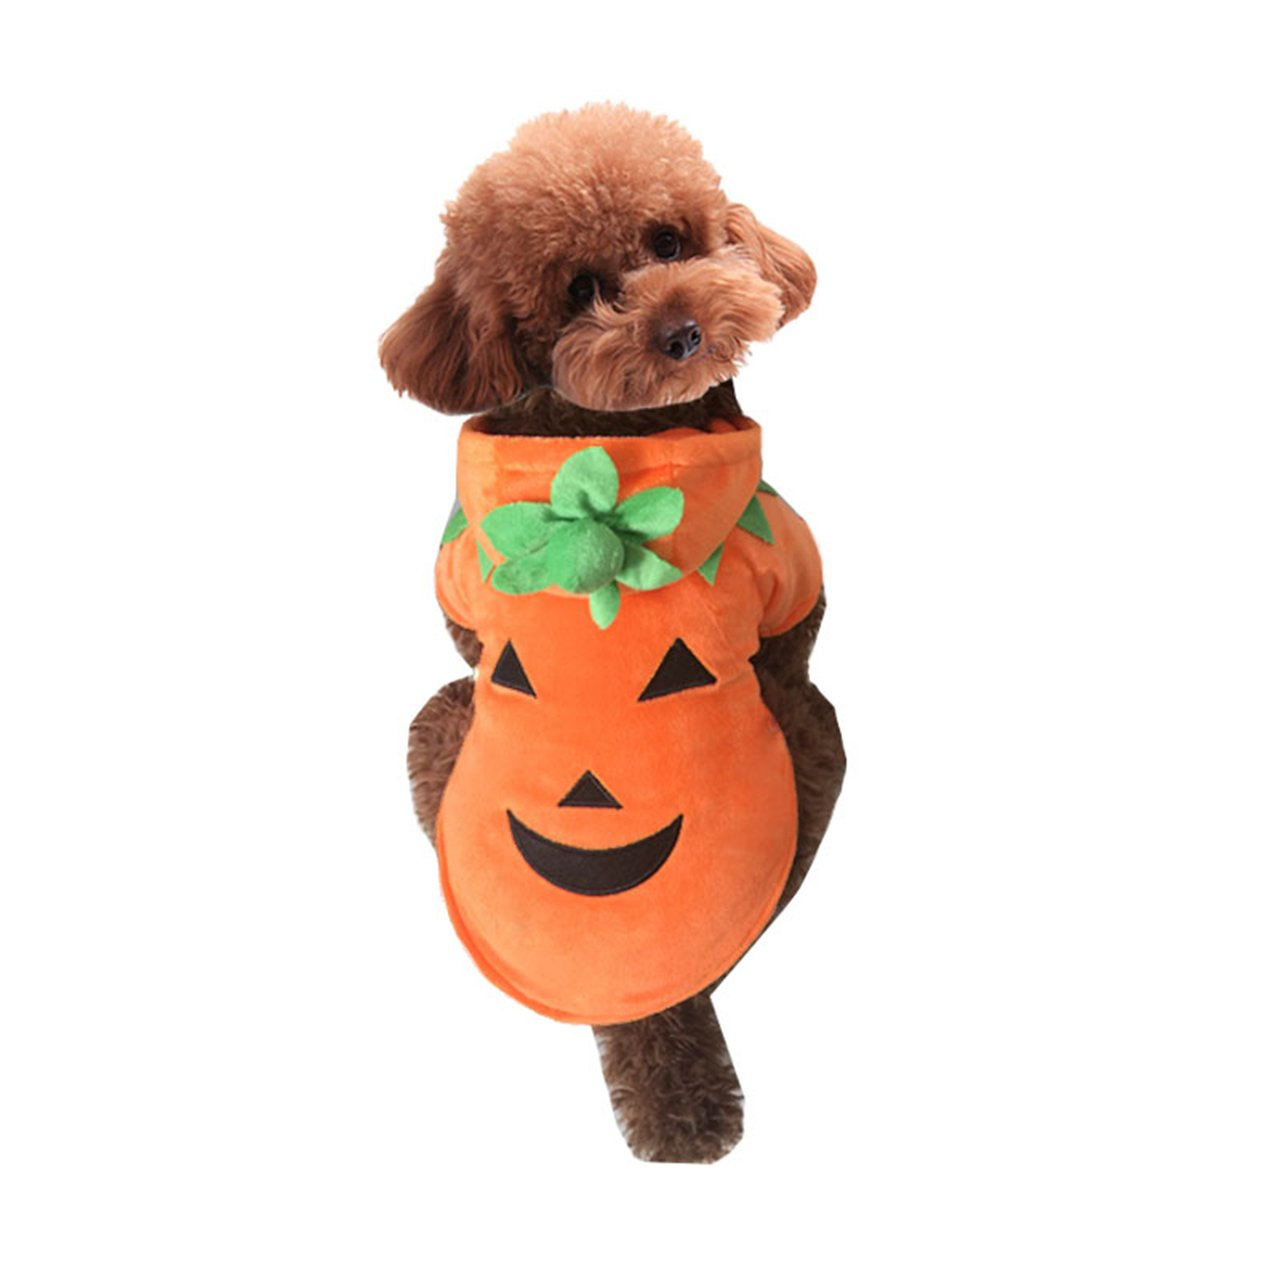 Mogoko Dog Cat Halloween Costumes, Funny Pet Cosplay Dress, Puppy Fleece Hoodie Coat Clothes,Autumn Winter Warm Jumpsuit Outfit Apparel MMUS2017100